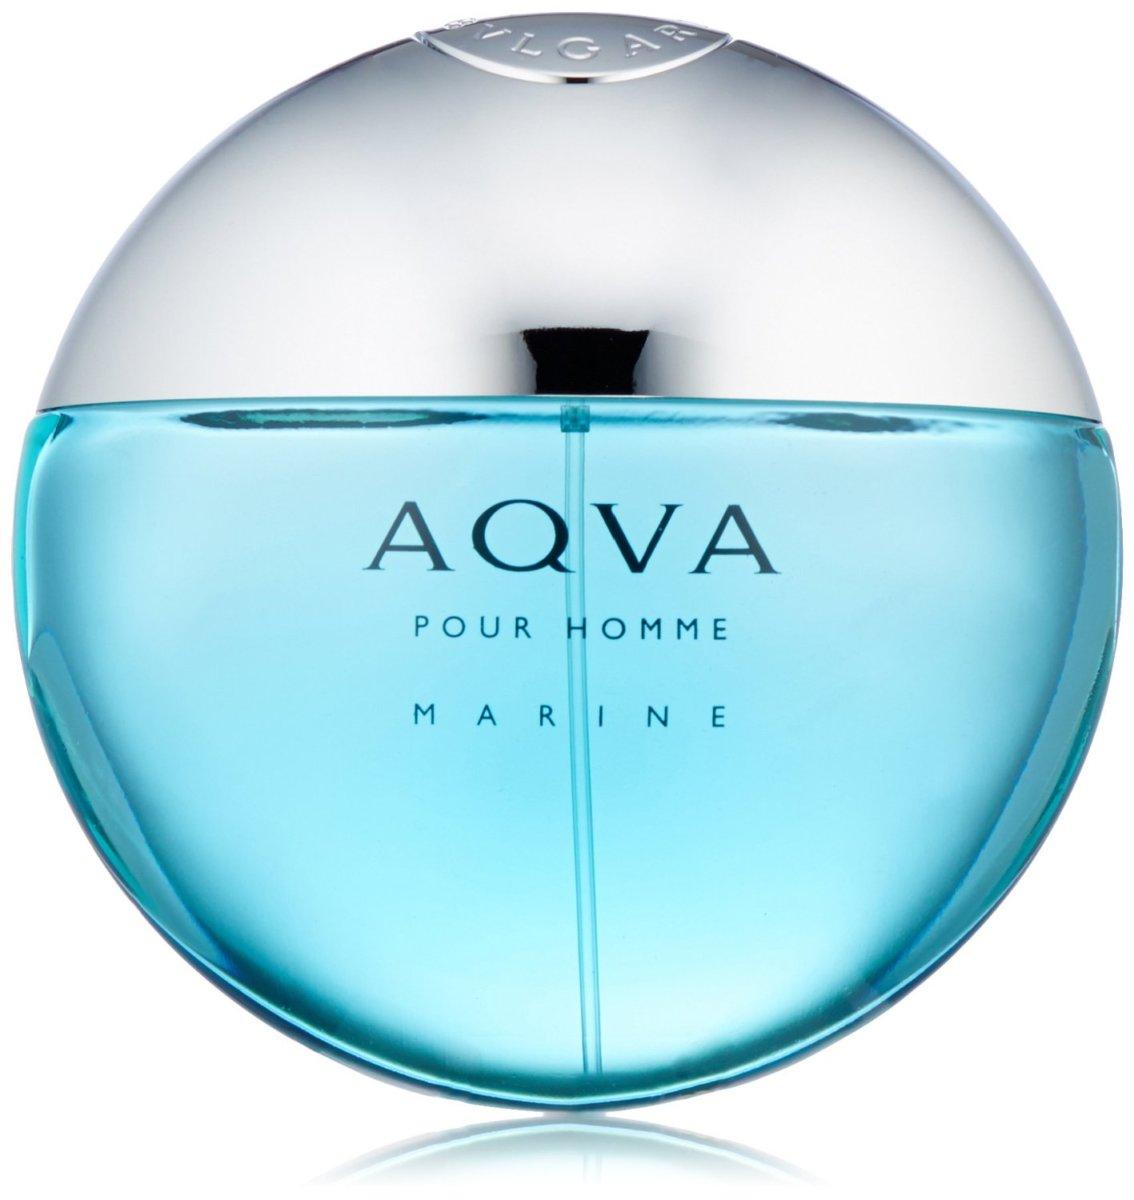 Colonia del mes: Aqva Pour Homme Marine Bvlgari